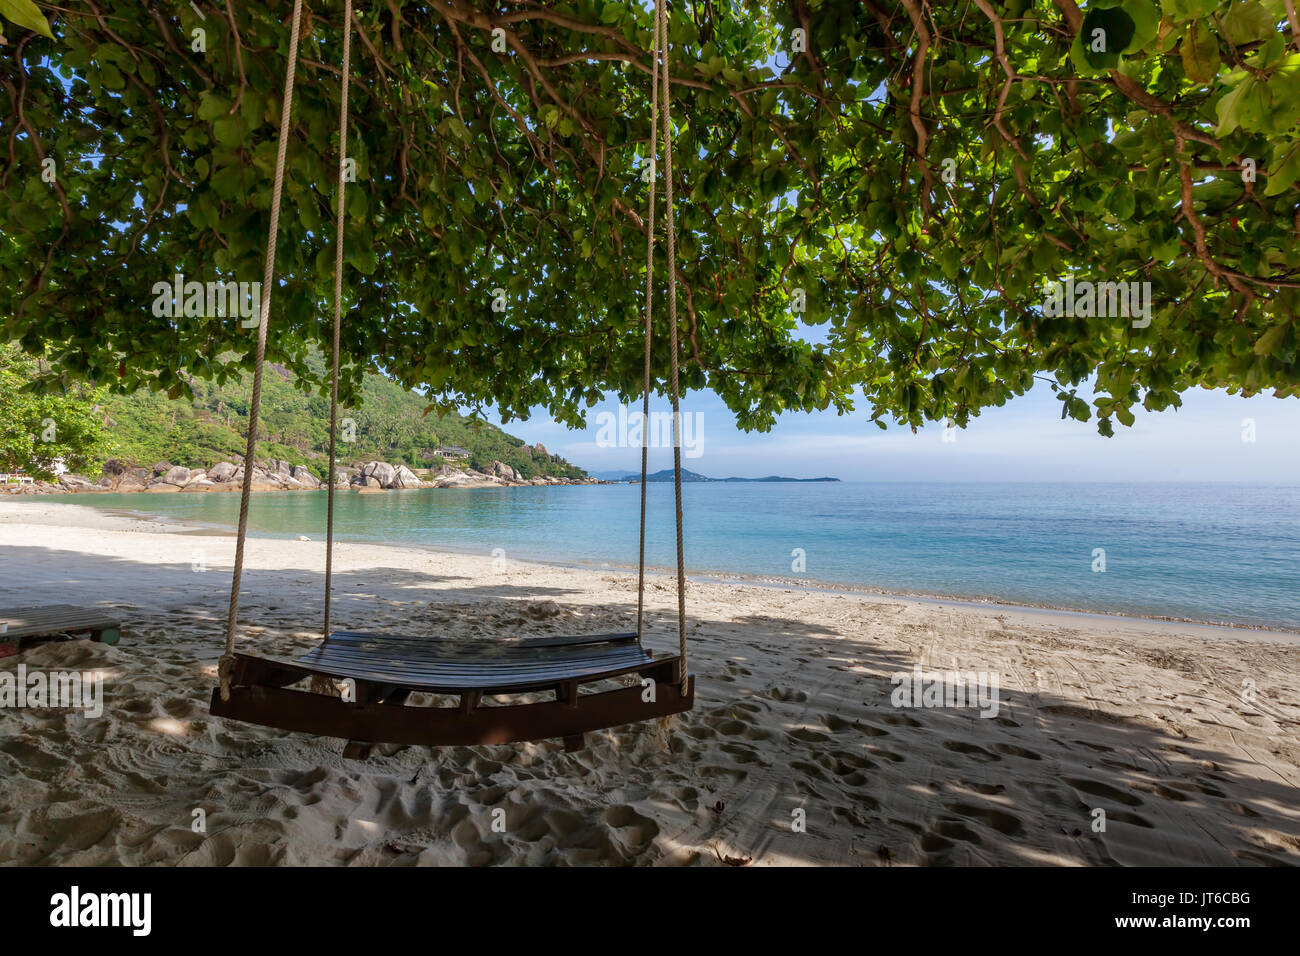 Silver beach, Koh Samui, Thailand - Stock Image